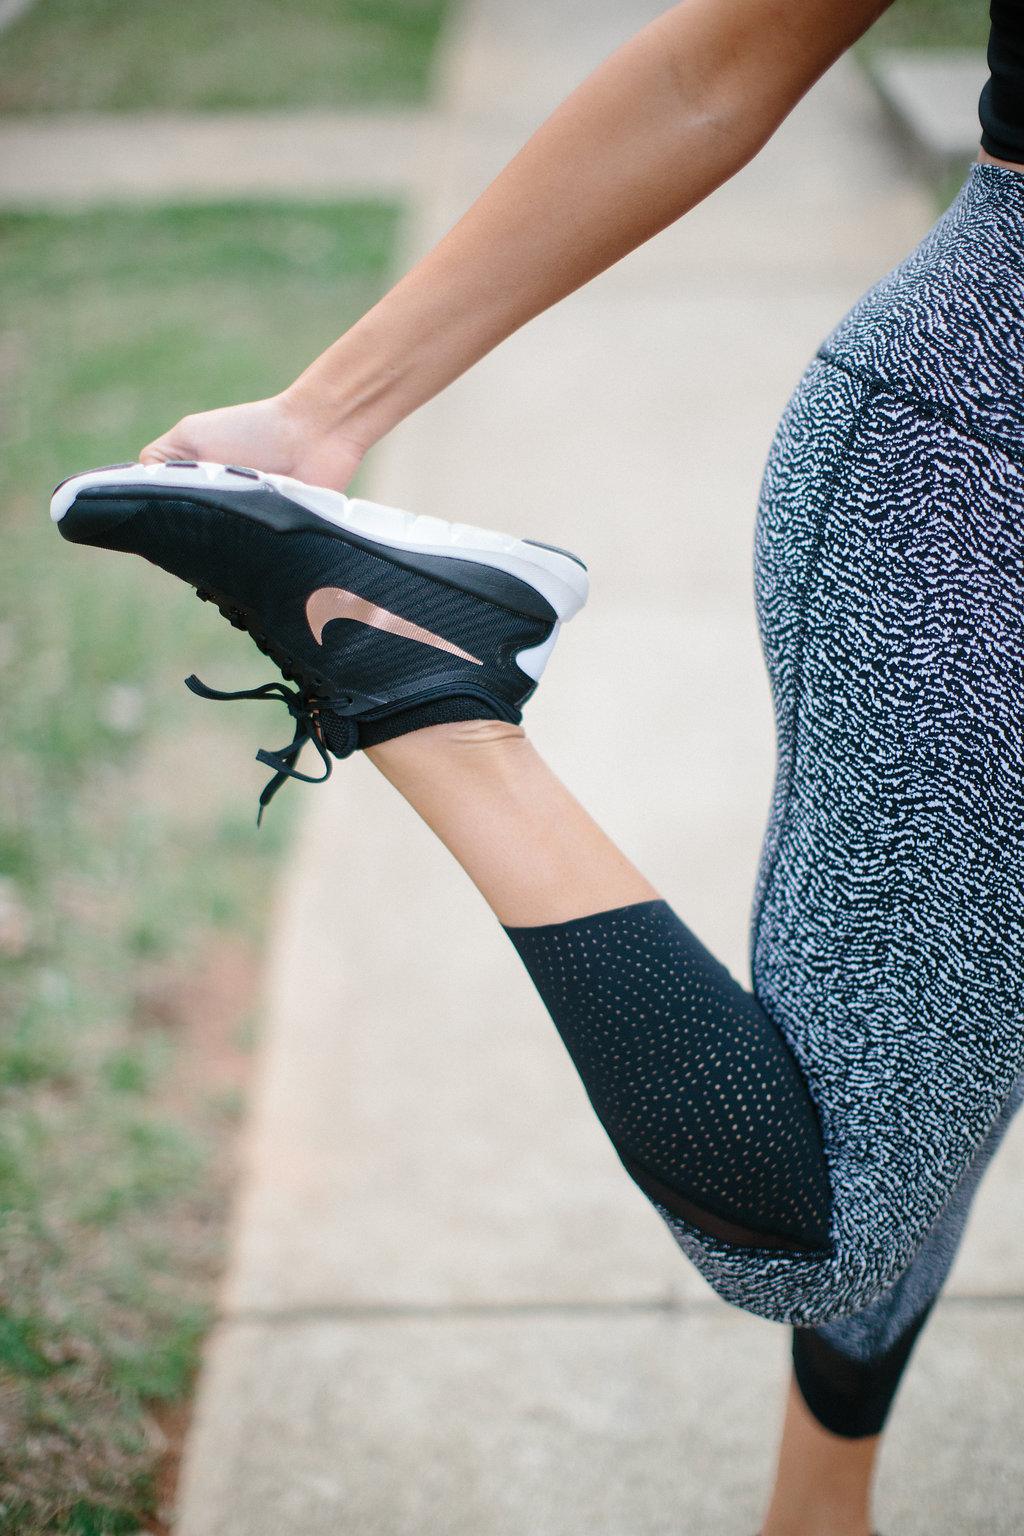 3a51dbf551557 Nike Women s Flex Supreme TR 4 Cross Trainer Shoes in Rose Gold     Lululemon Double Tap Bra II    Lululemon Short Stop Tank    Lululemon  Simply Bare Bra ...